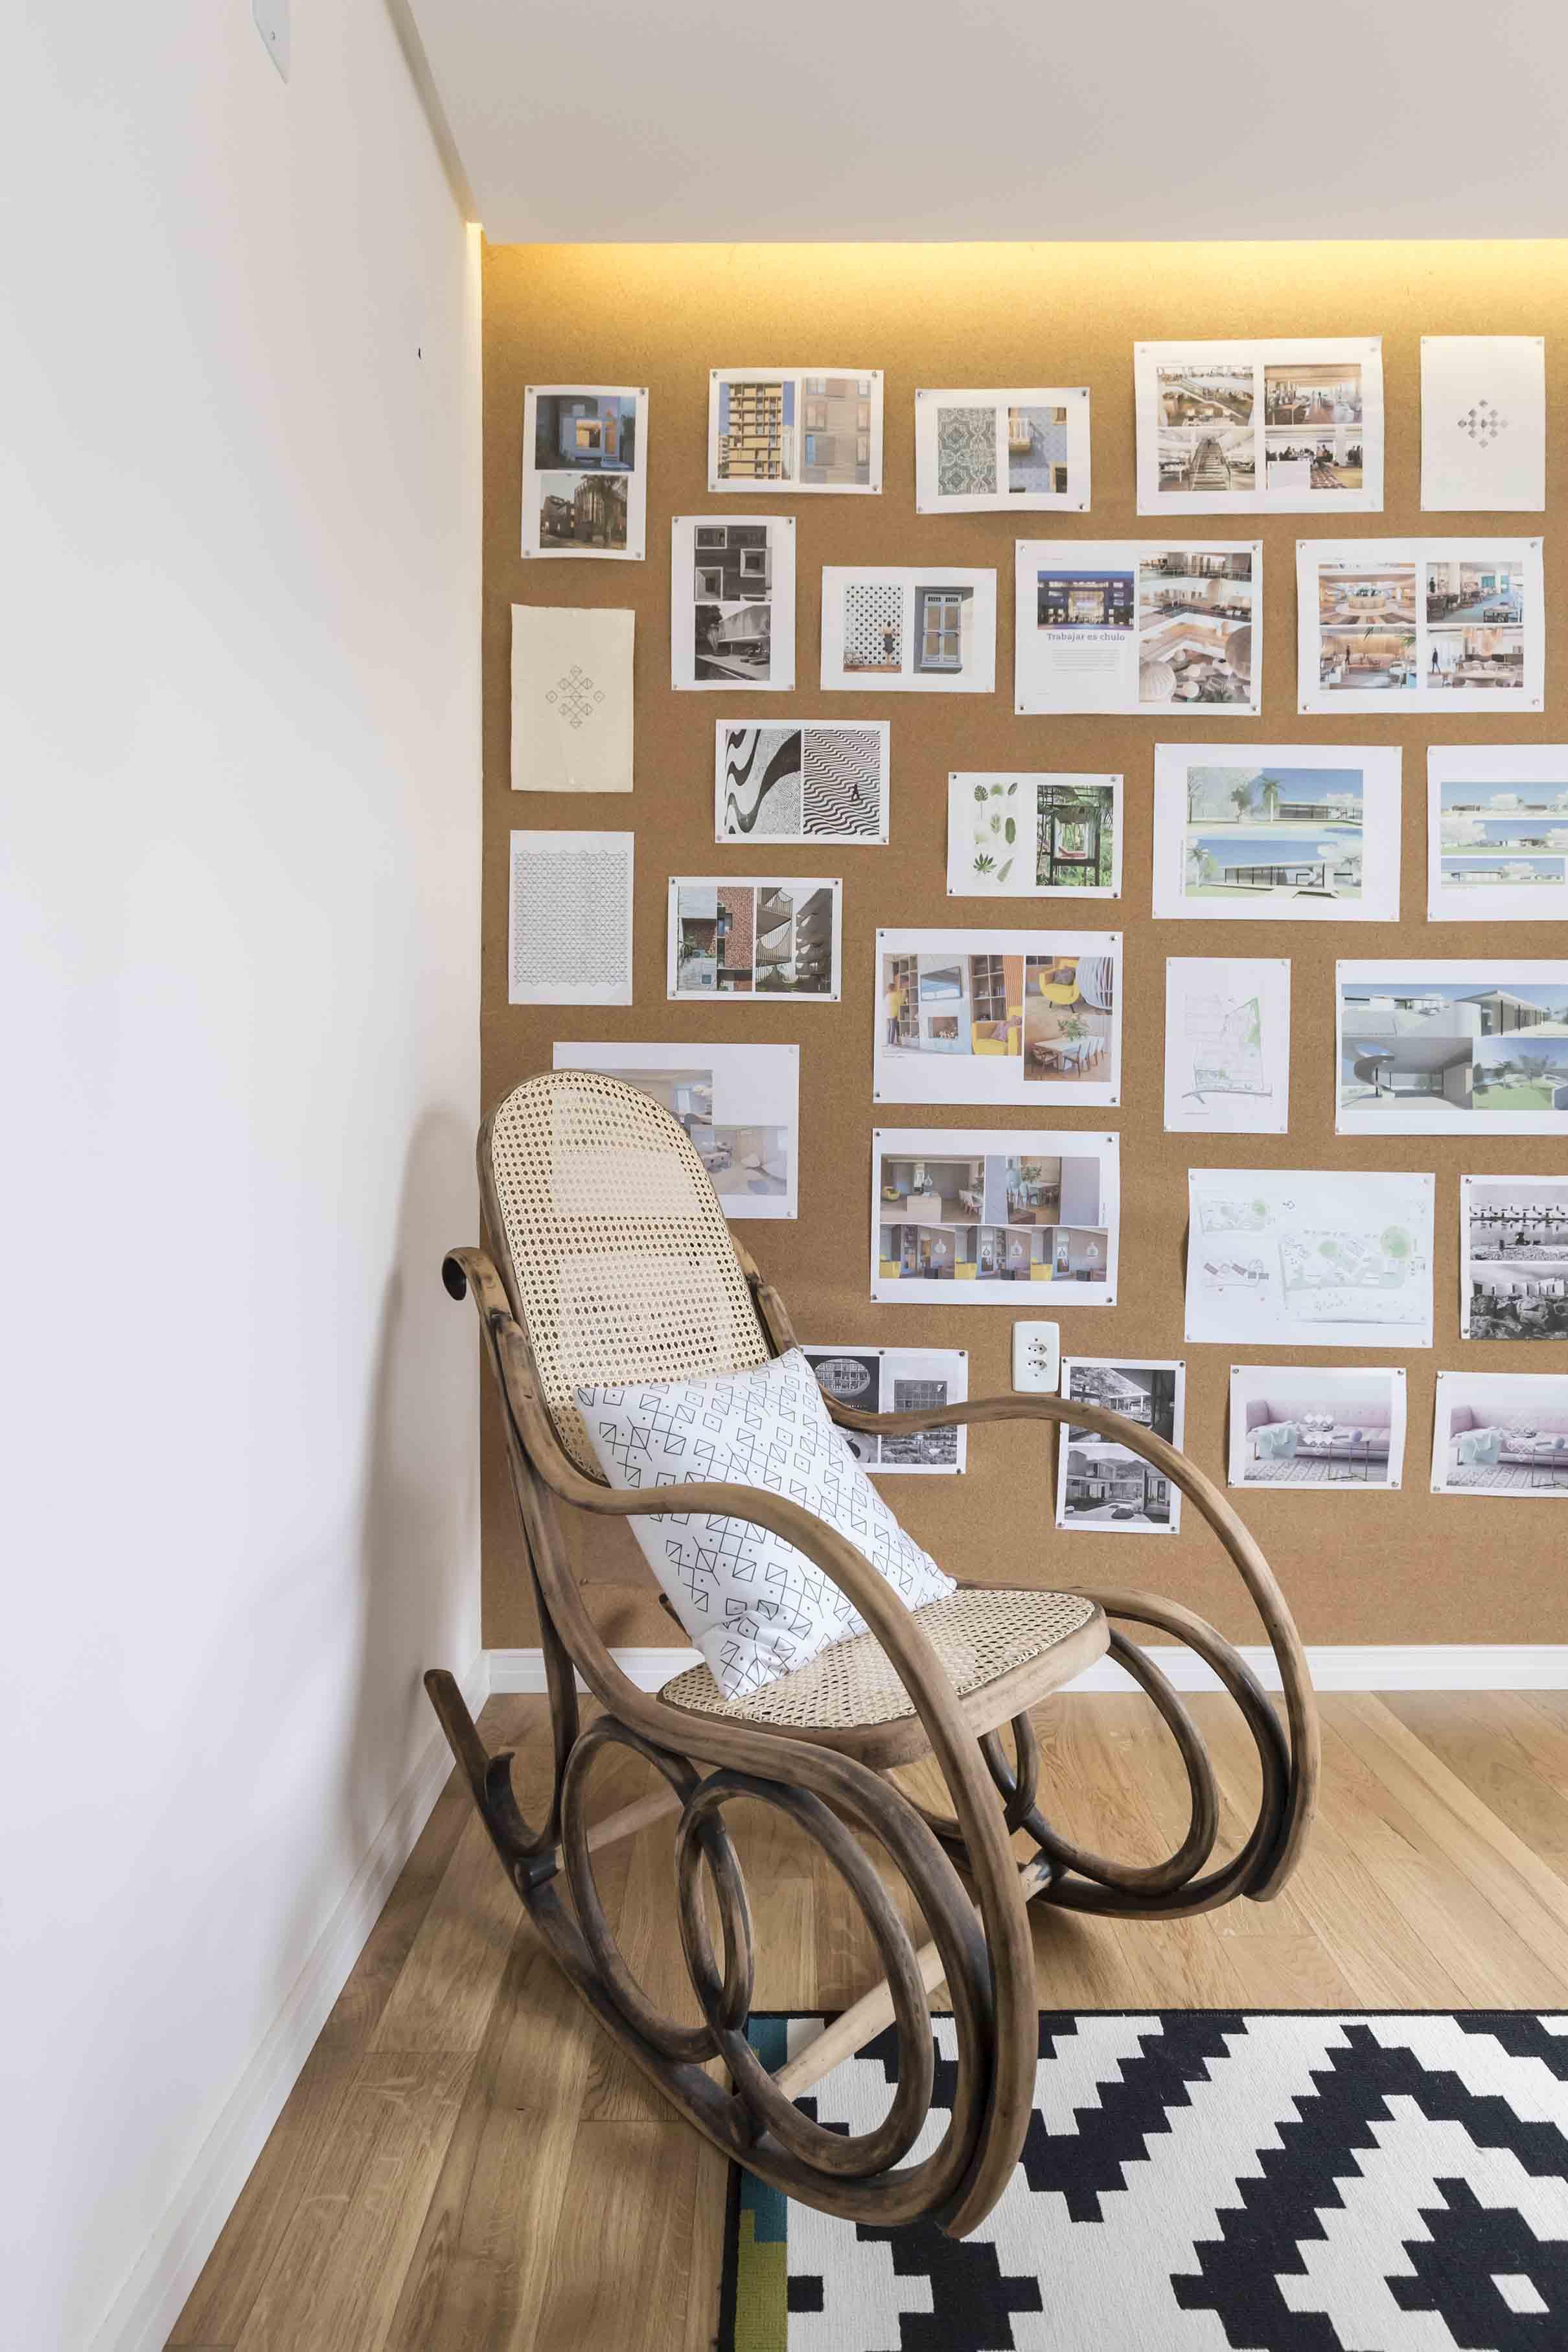 Home Office projeto Camila Cavalheiro foto de Marcelo Donadussi md2017 12 04 172538 1